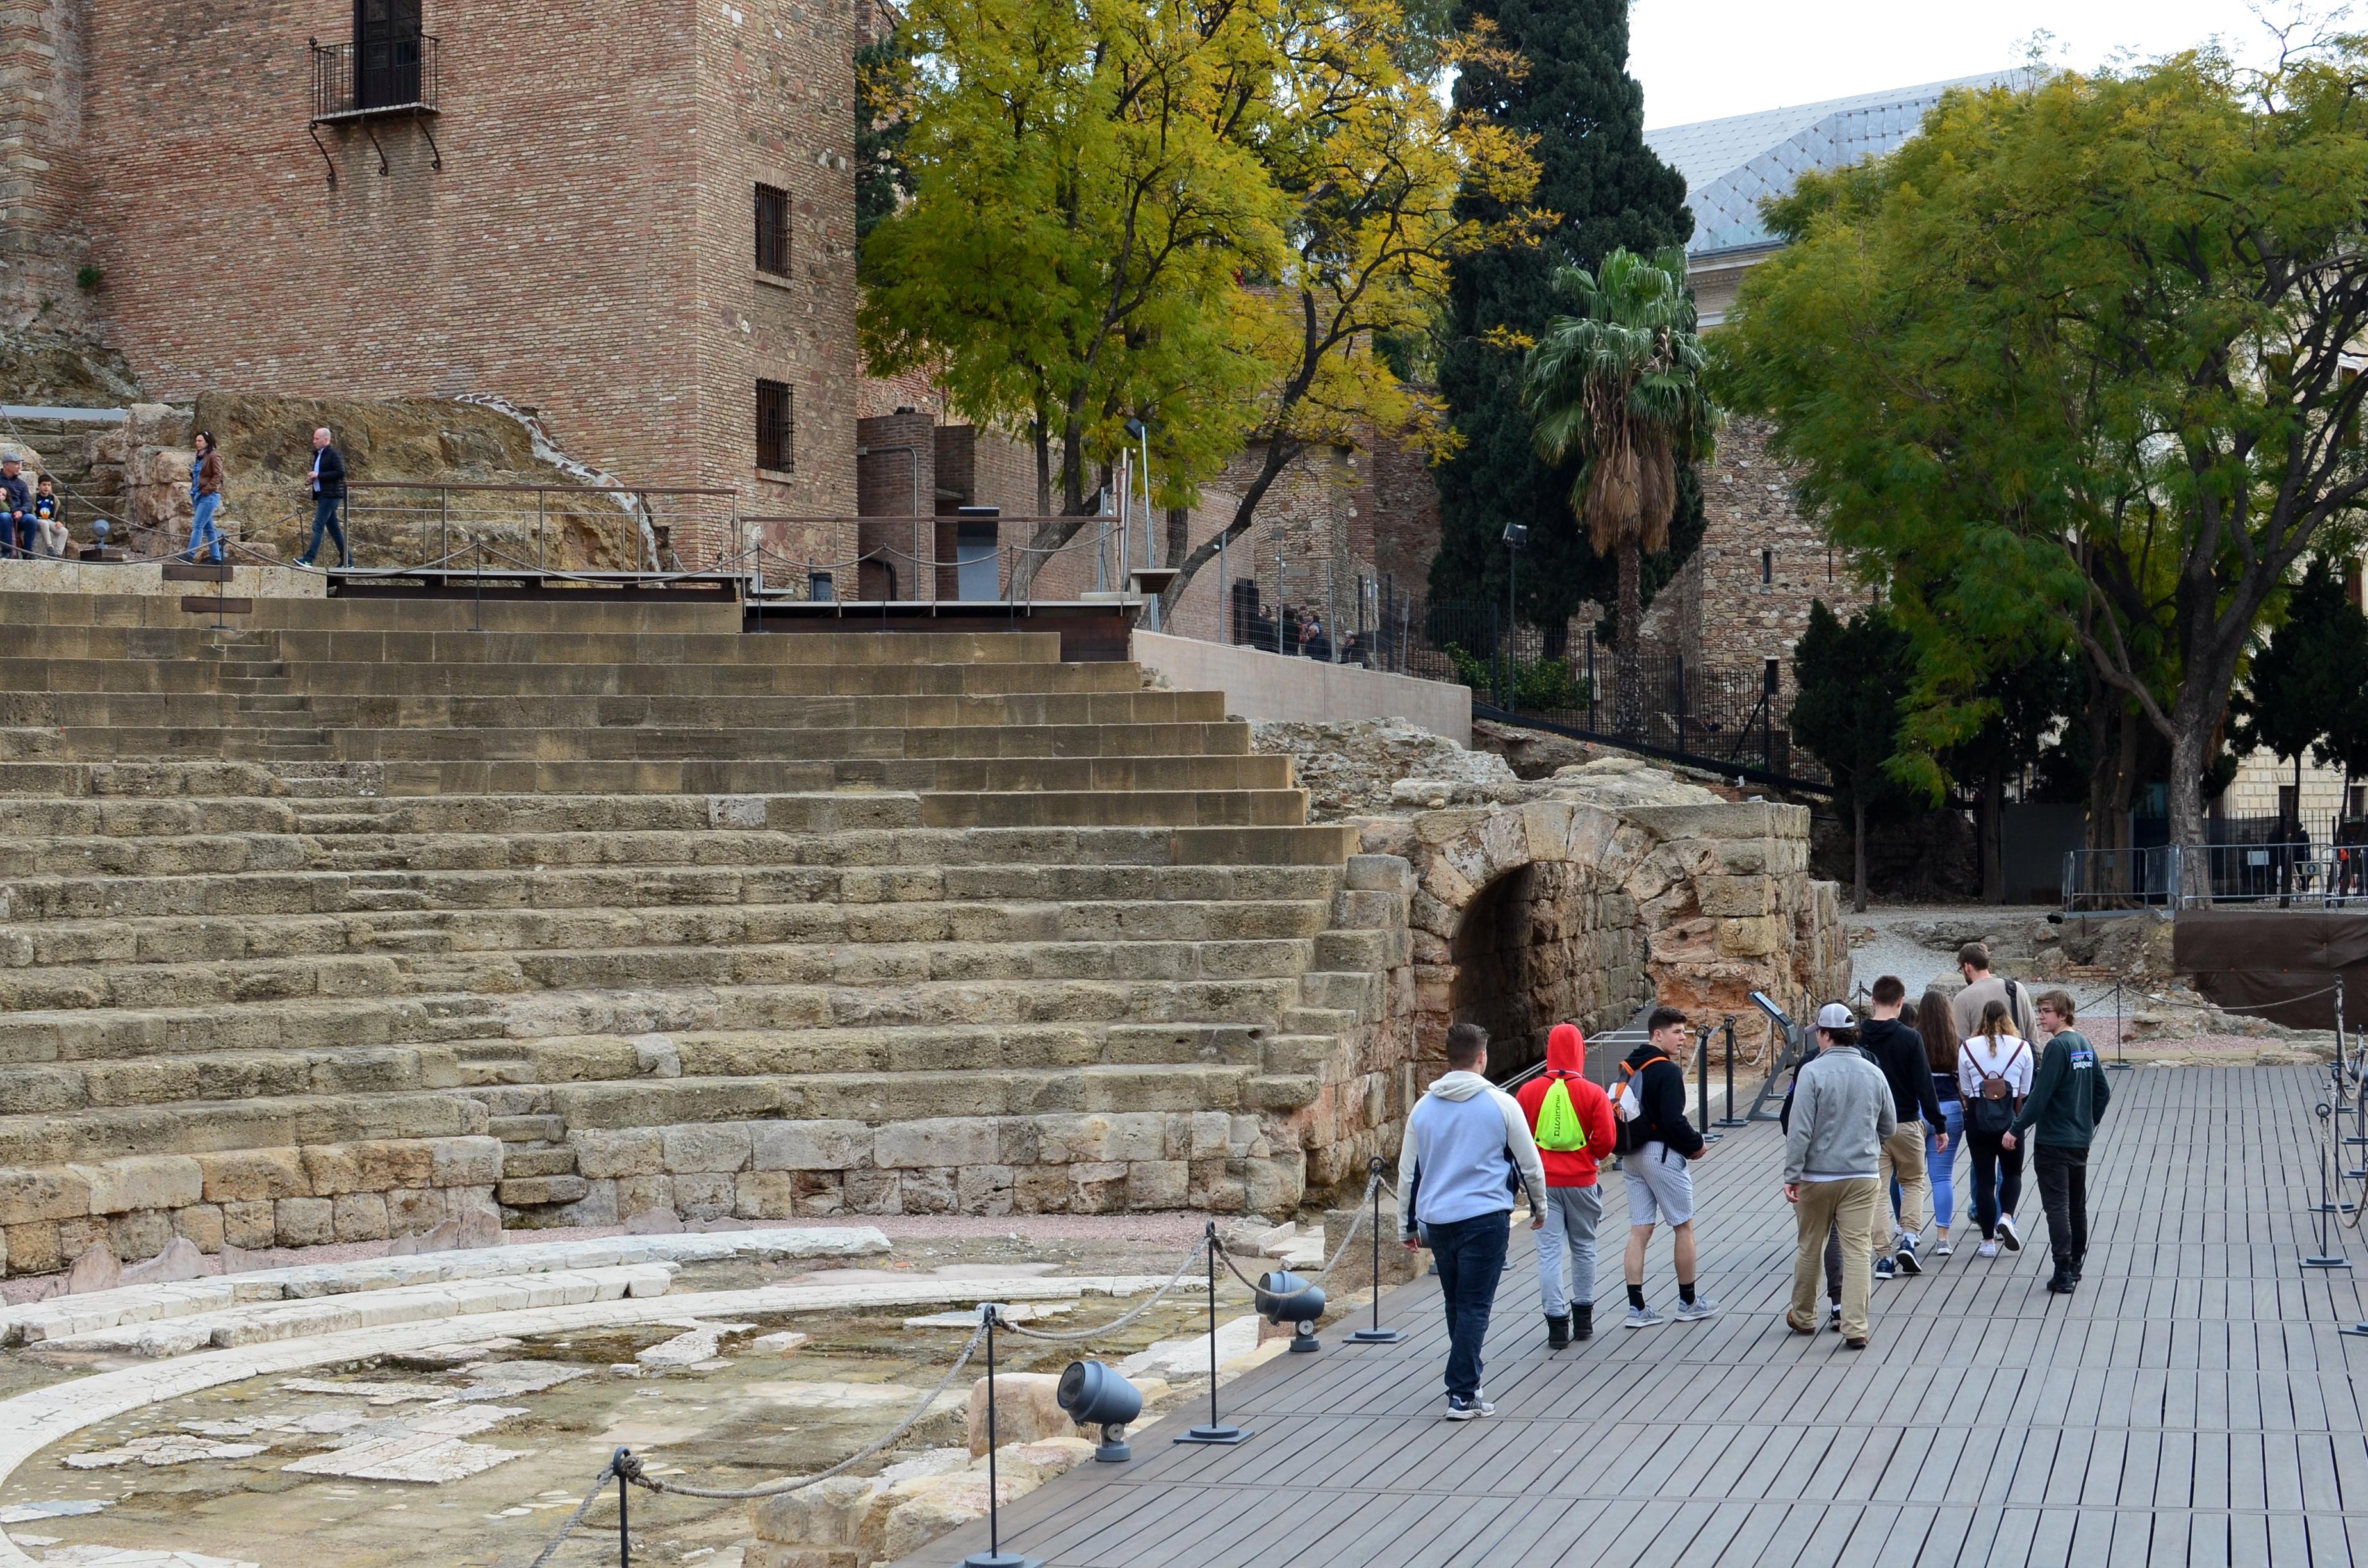 Proctor en Segovia visits the Roman theater of Málaga